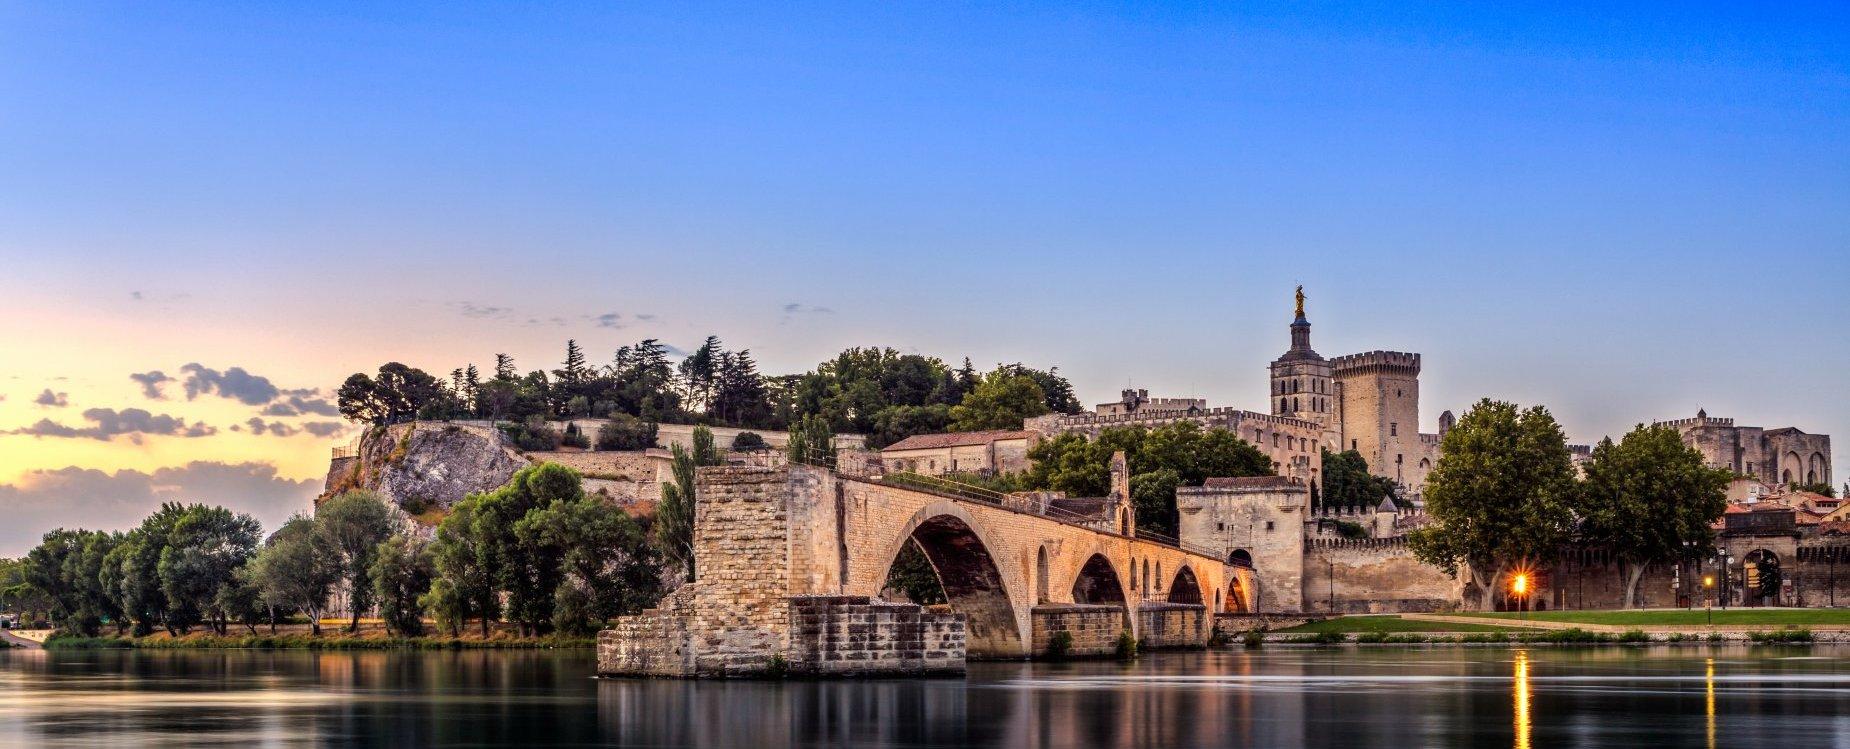 Avignon Provence 187 French City Travel Guide 187 Cellartours